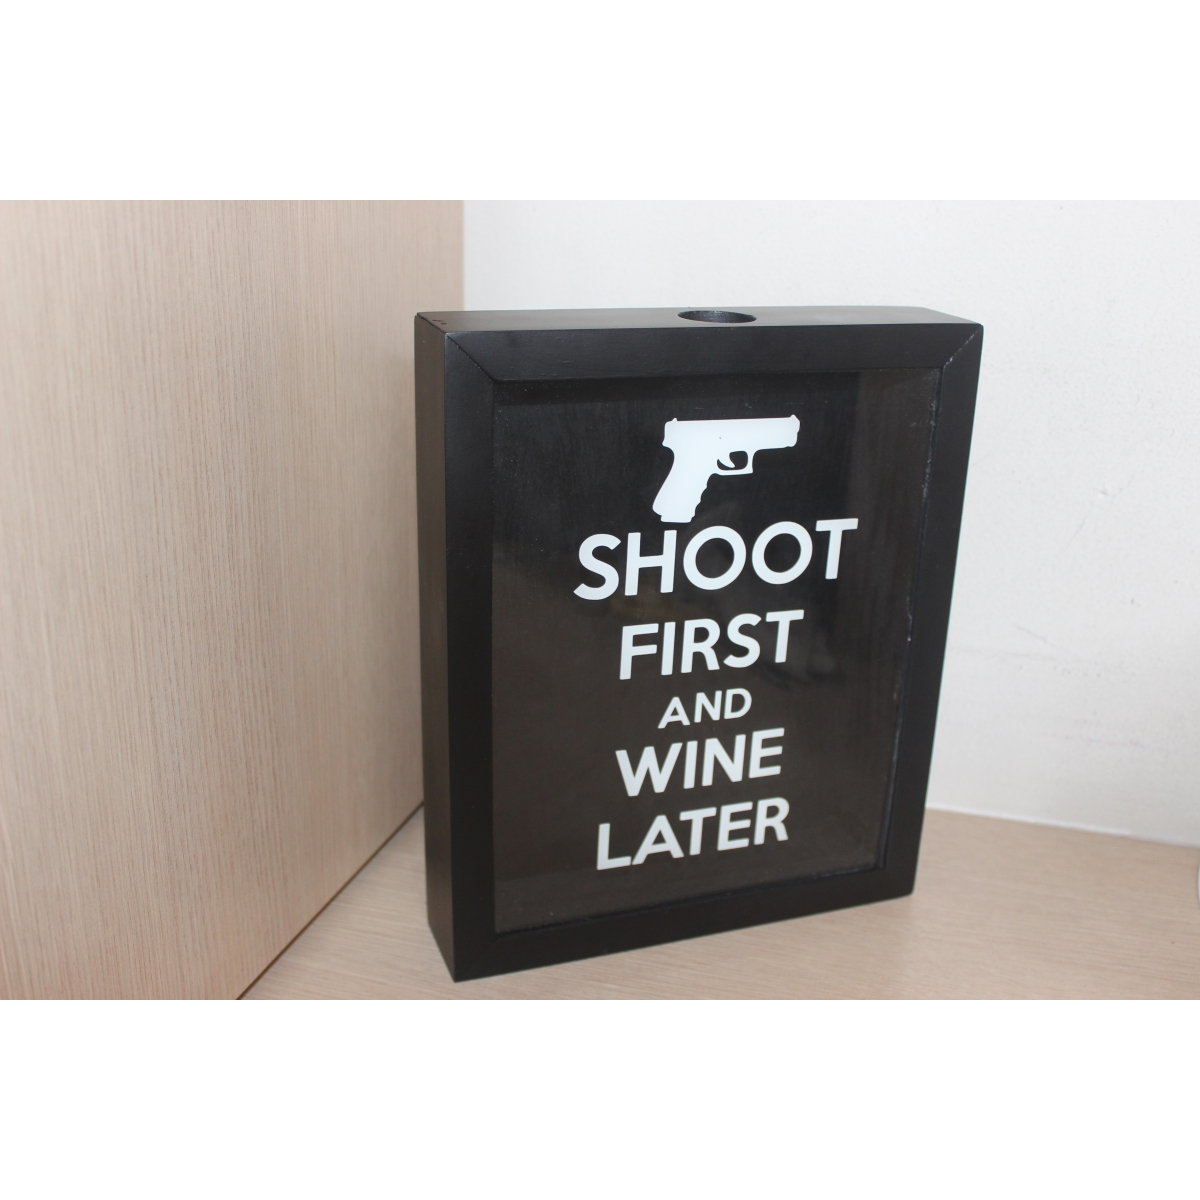 Quadro Decorativo Porta Cápsulas - SHOOT FIRST AND WINE LATER